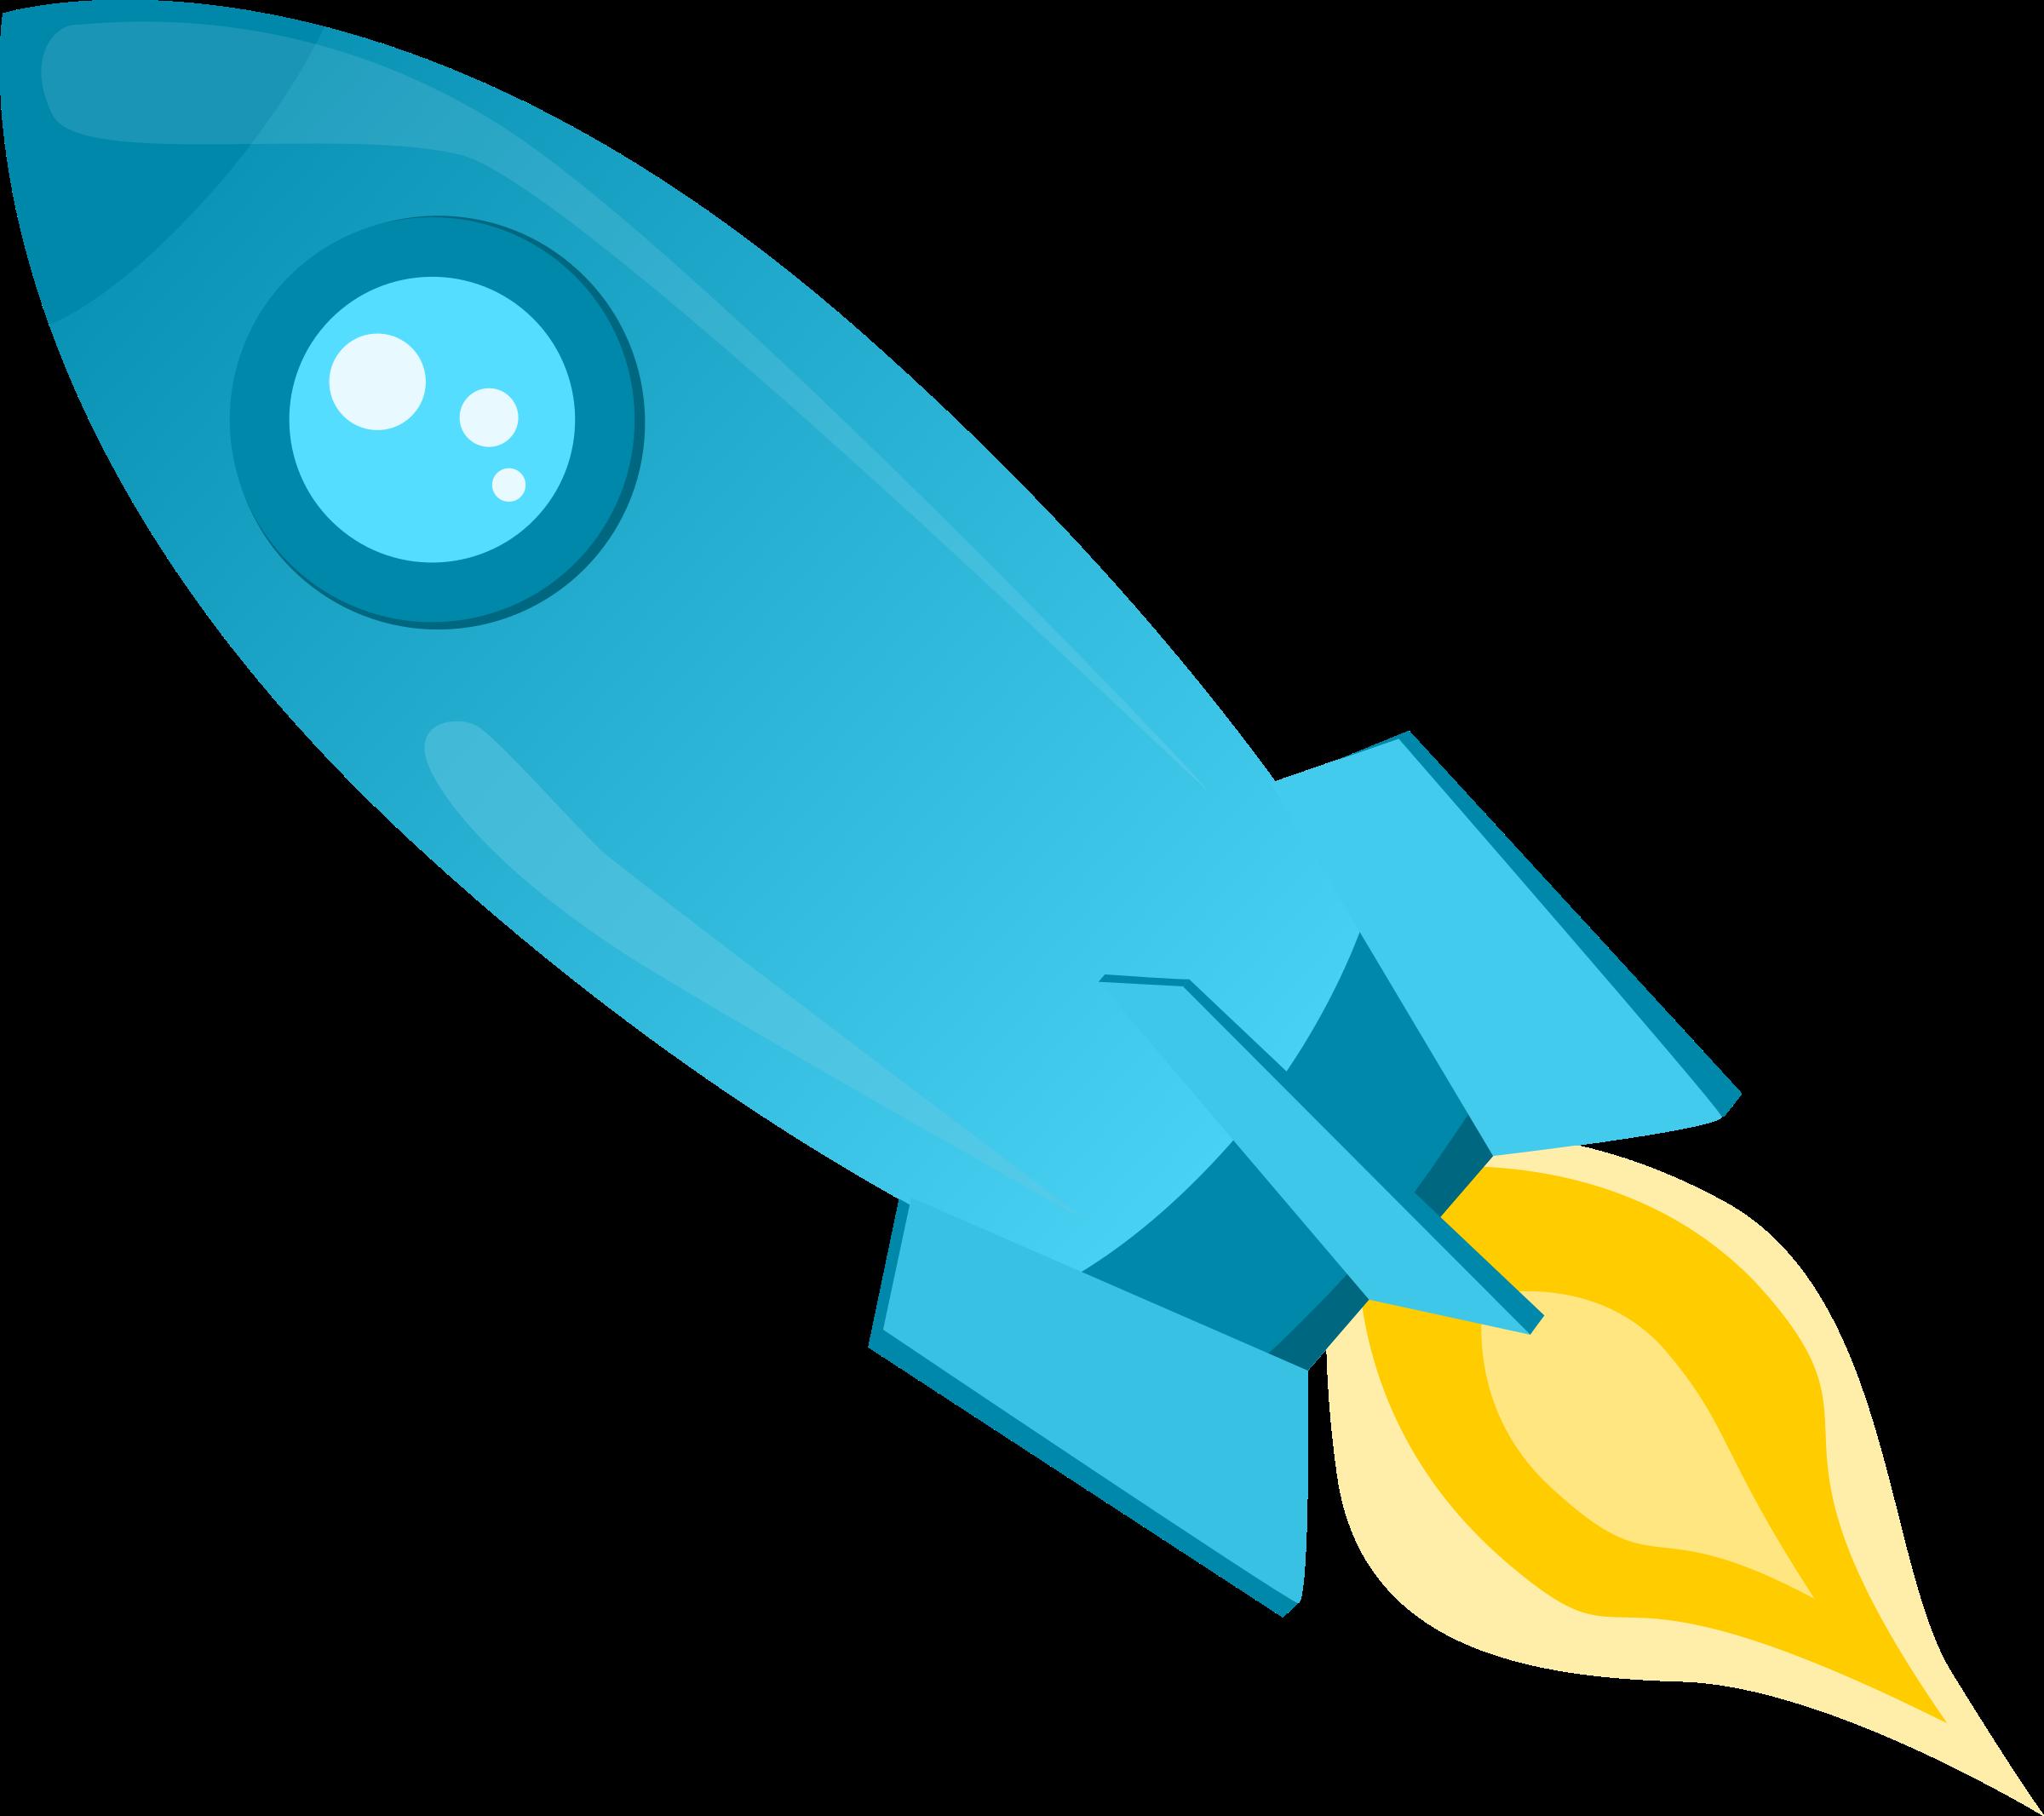 Big image png. Clipart rocket blue